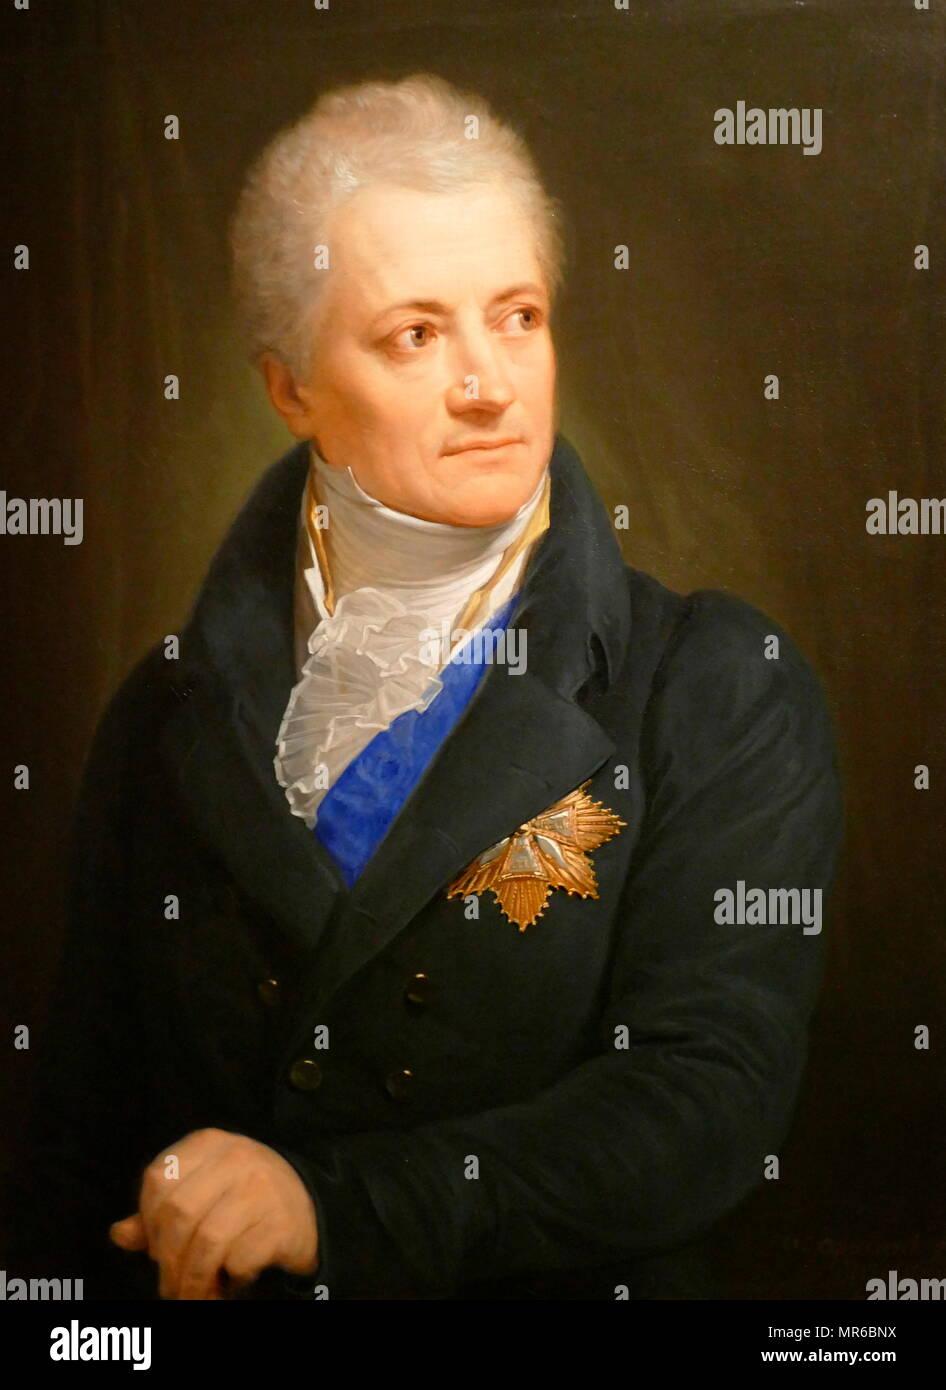 Kazimierz Rzewuski (c. 1750-1820), a member of the Polish parliament (Sejm). Portrait by Andrea Appiani, 1806 - Stock Image